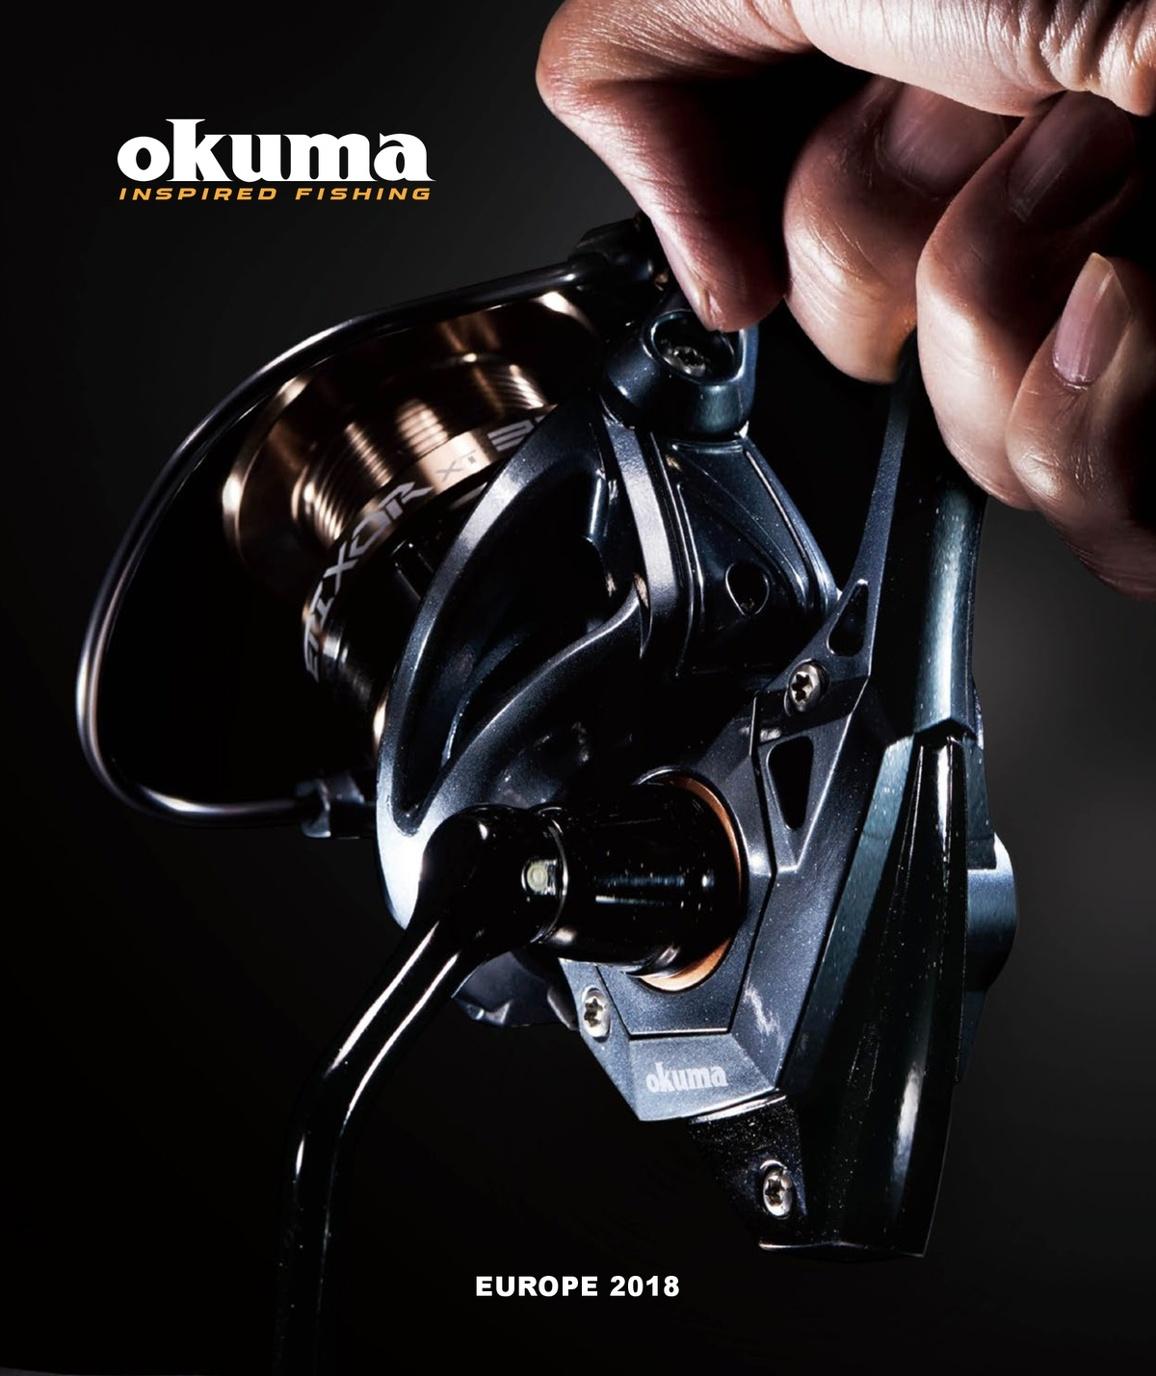 305a2f40af39f Okuma Fishing Tackle Europe 2018 Consumer Catalogue